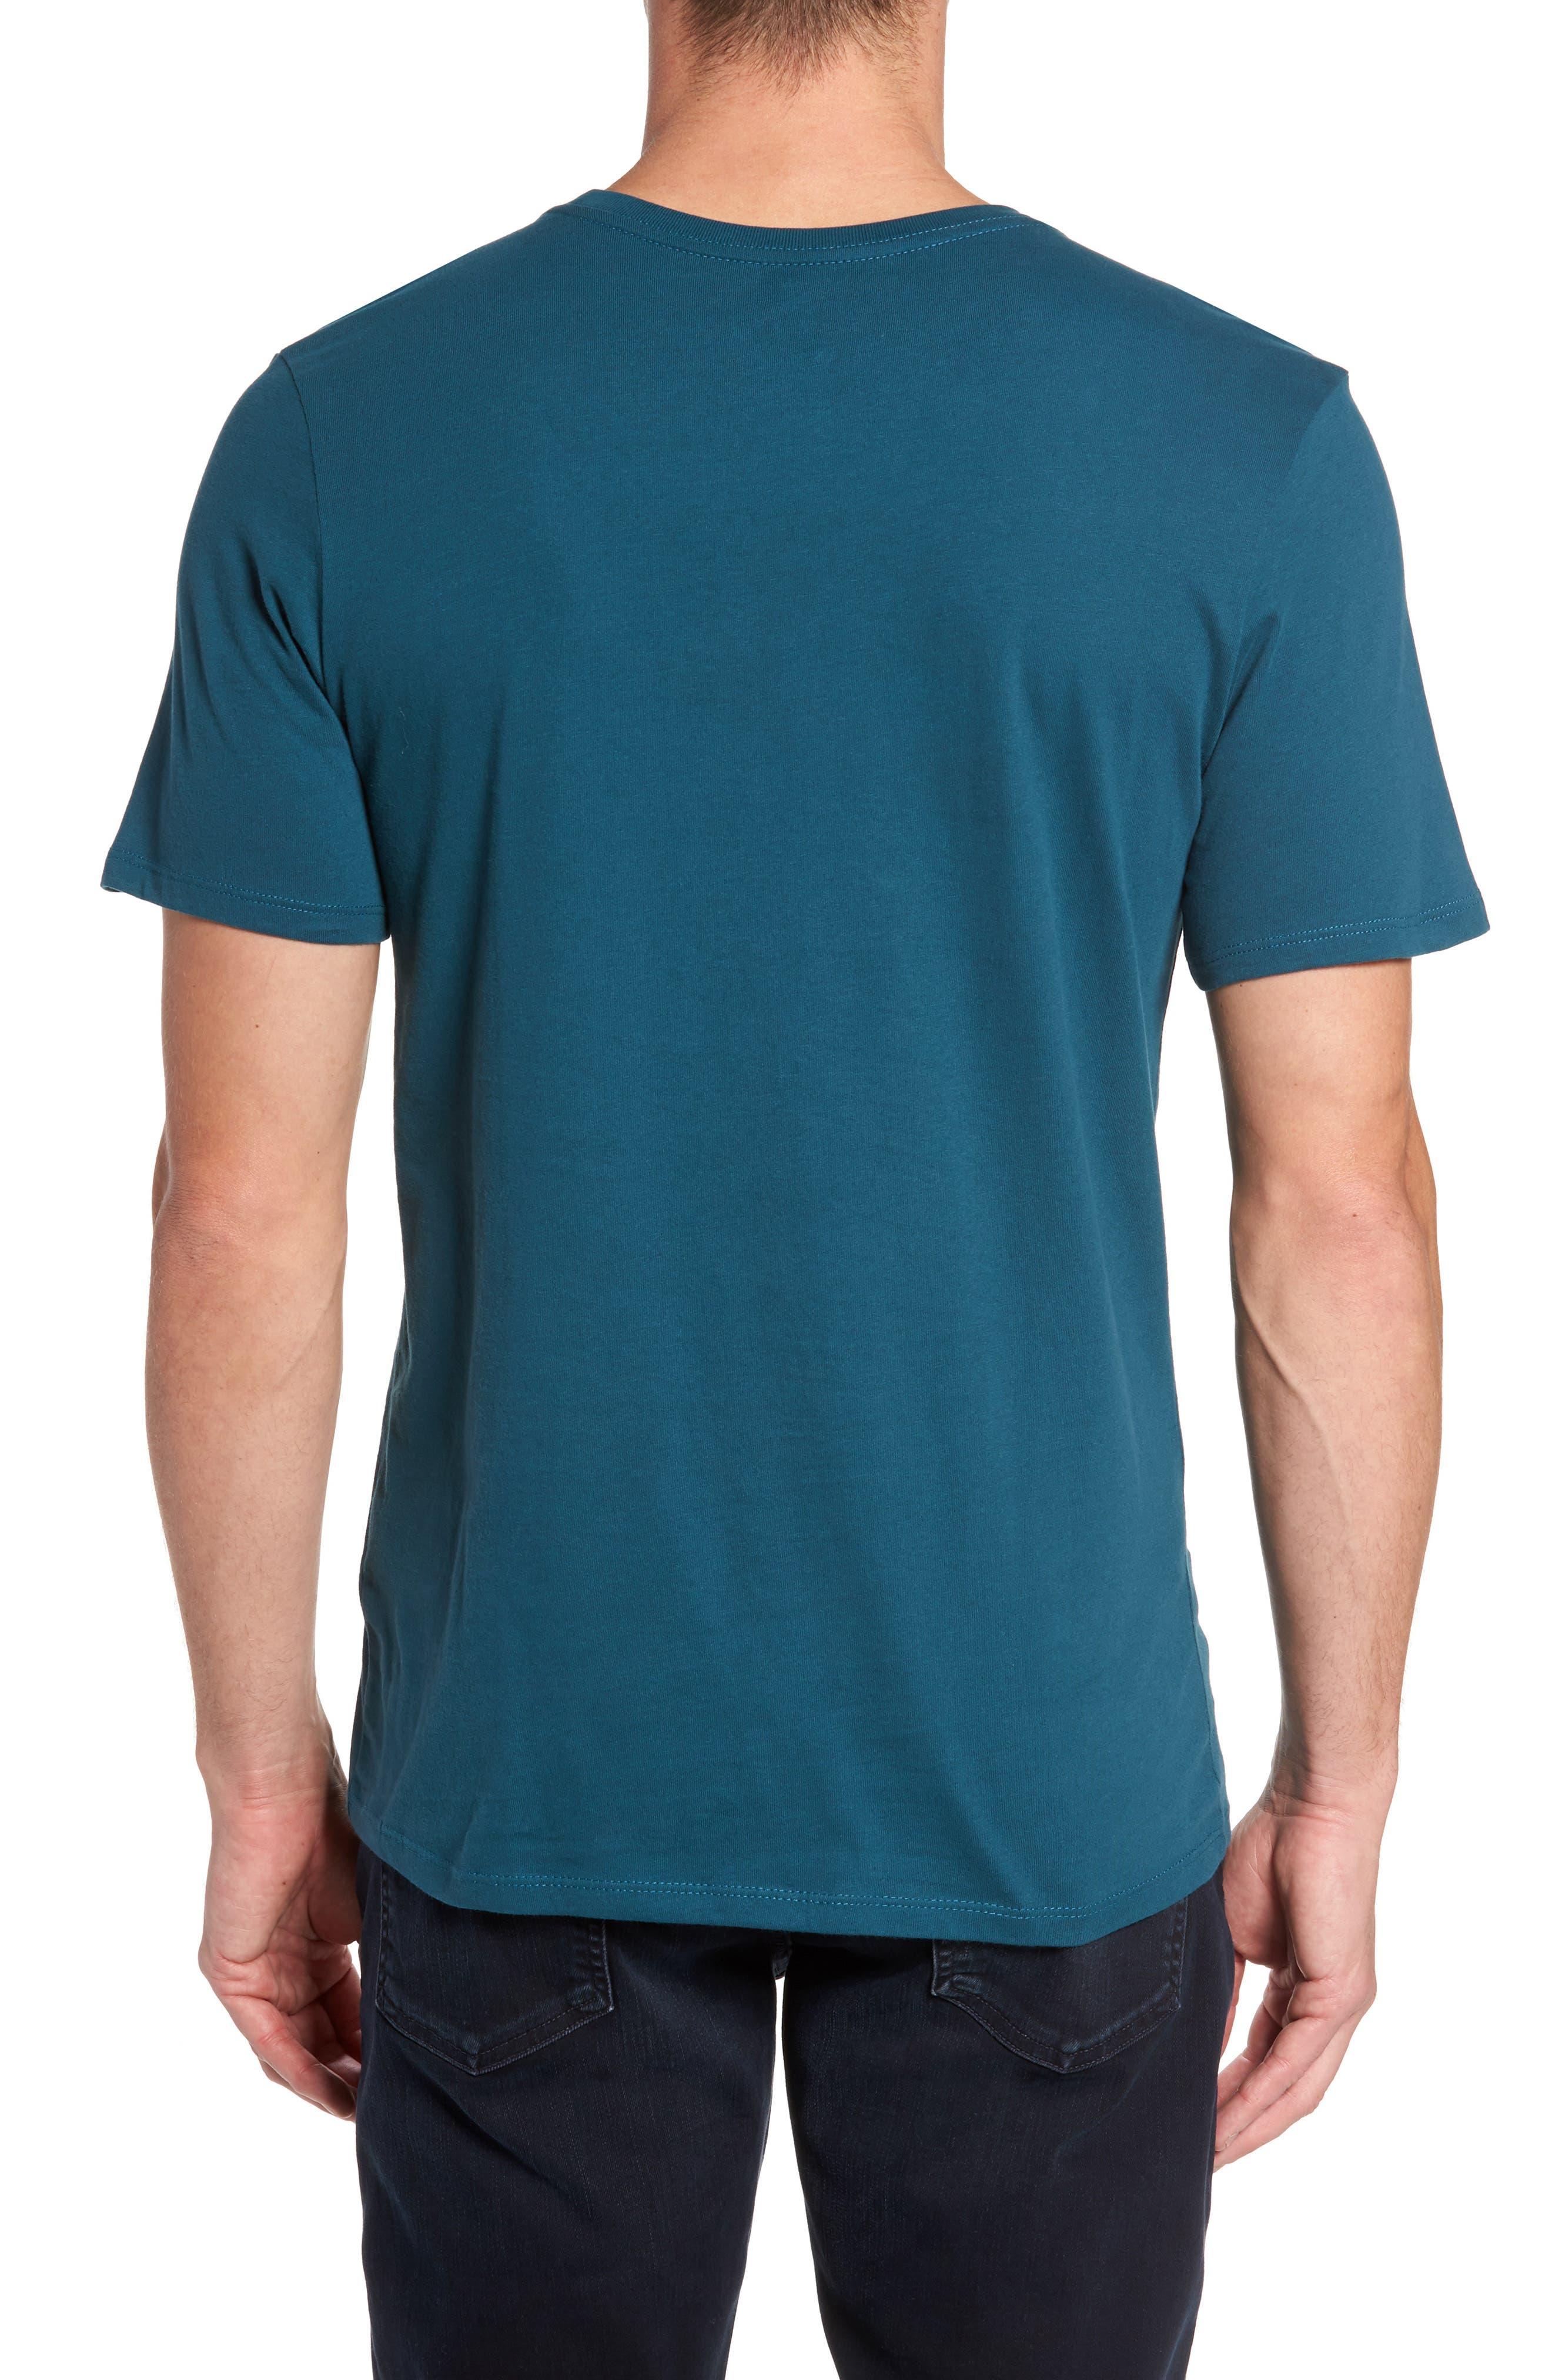 'Tee-Futura Icon' Graphic T-Shirt,                             Alternate thumbnail 2, color,                             Space Blue/ White